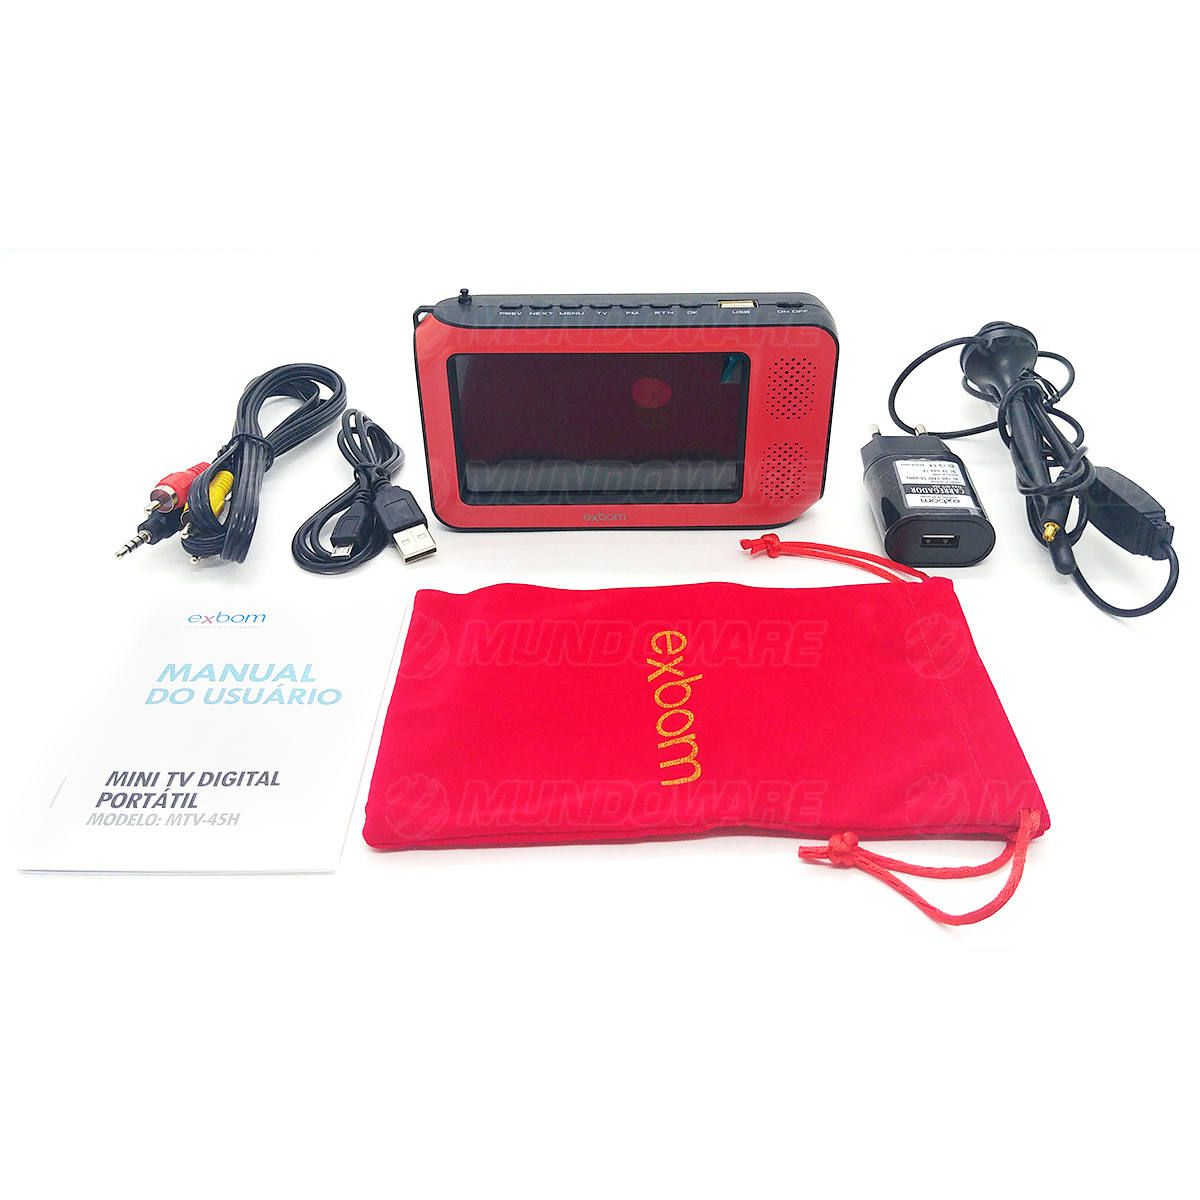 "Mini TV Digital Portátil 4.3"" Suporta 1080p Full HD Entrada USB MicroSD Rádio FM ISDBT Exbom MTV-45H"